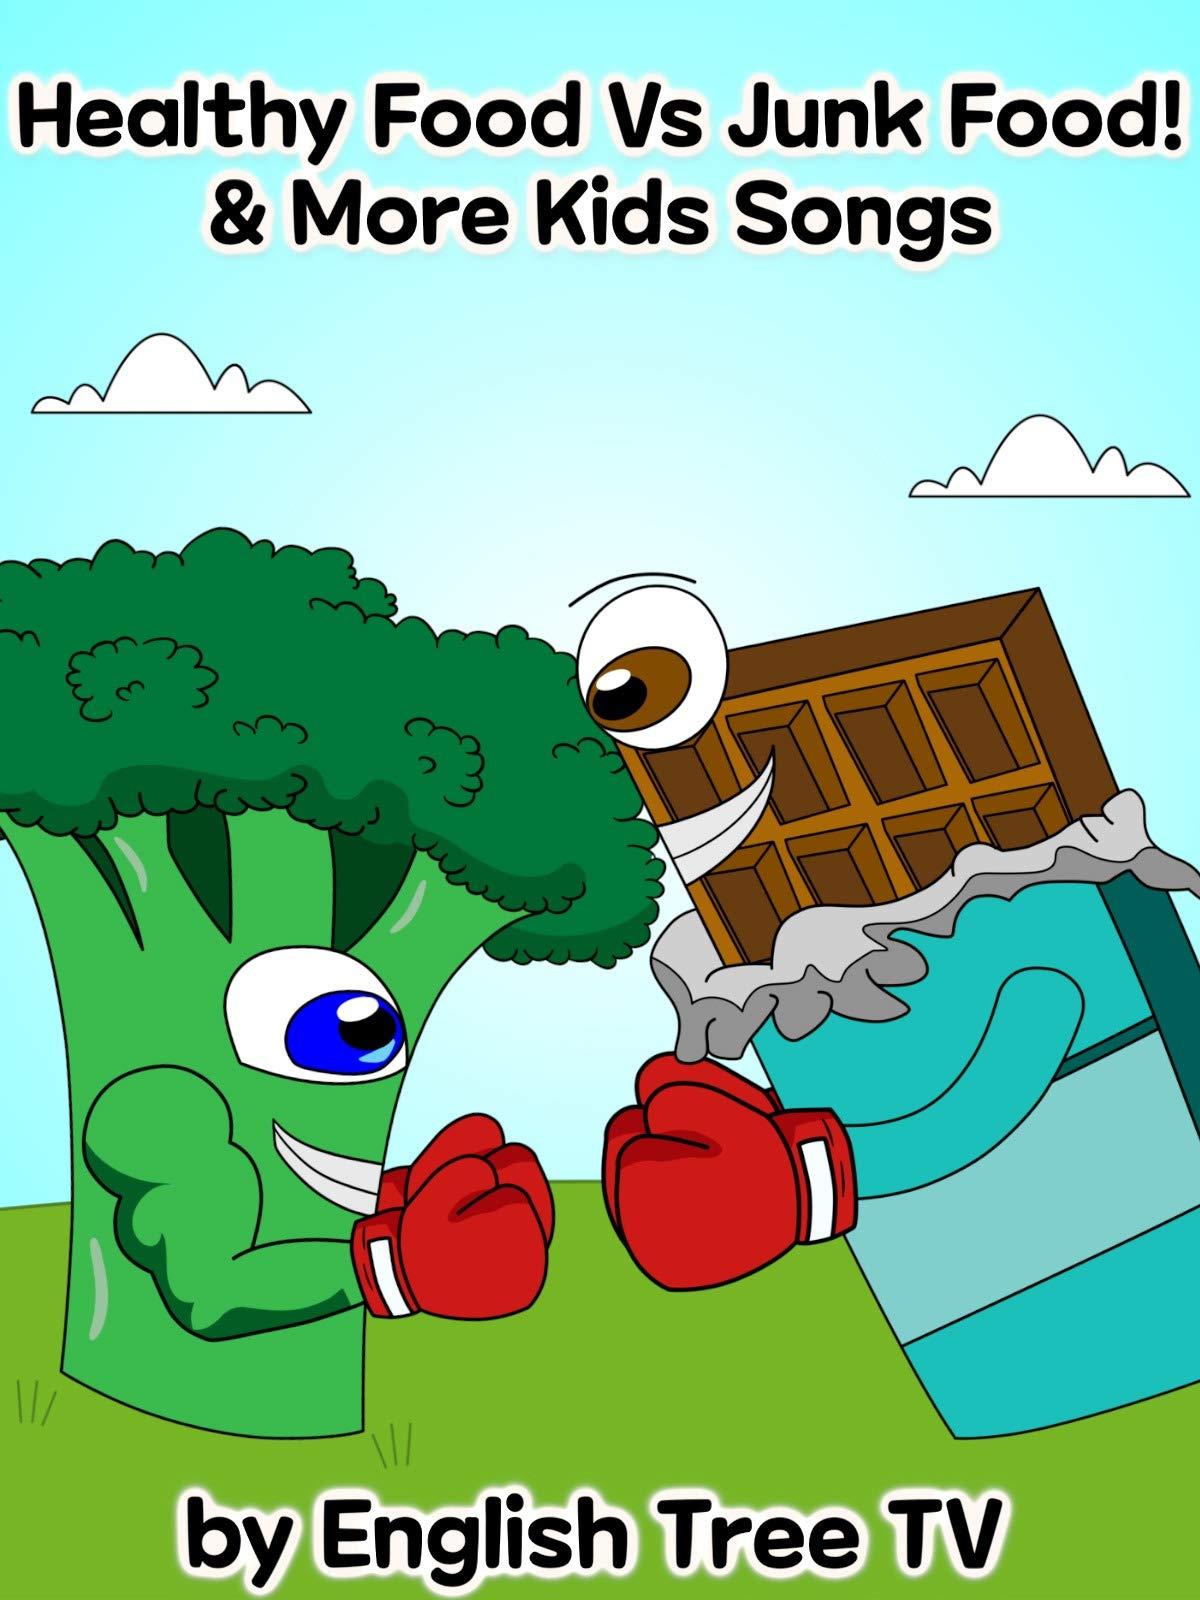 Healthy Food vs Junk Food! & More Kids Songs - by English Tree Tv